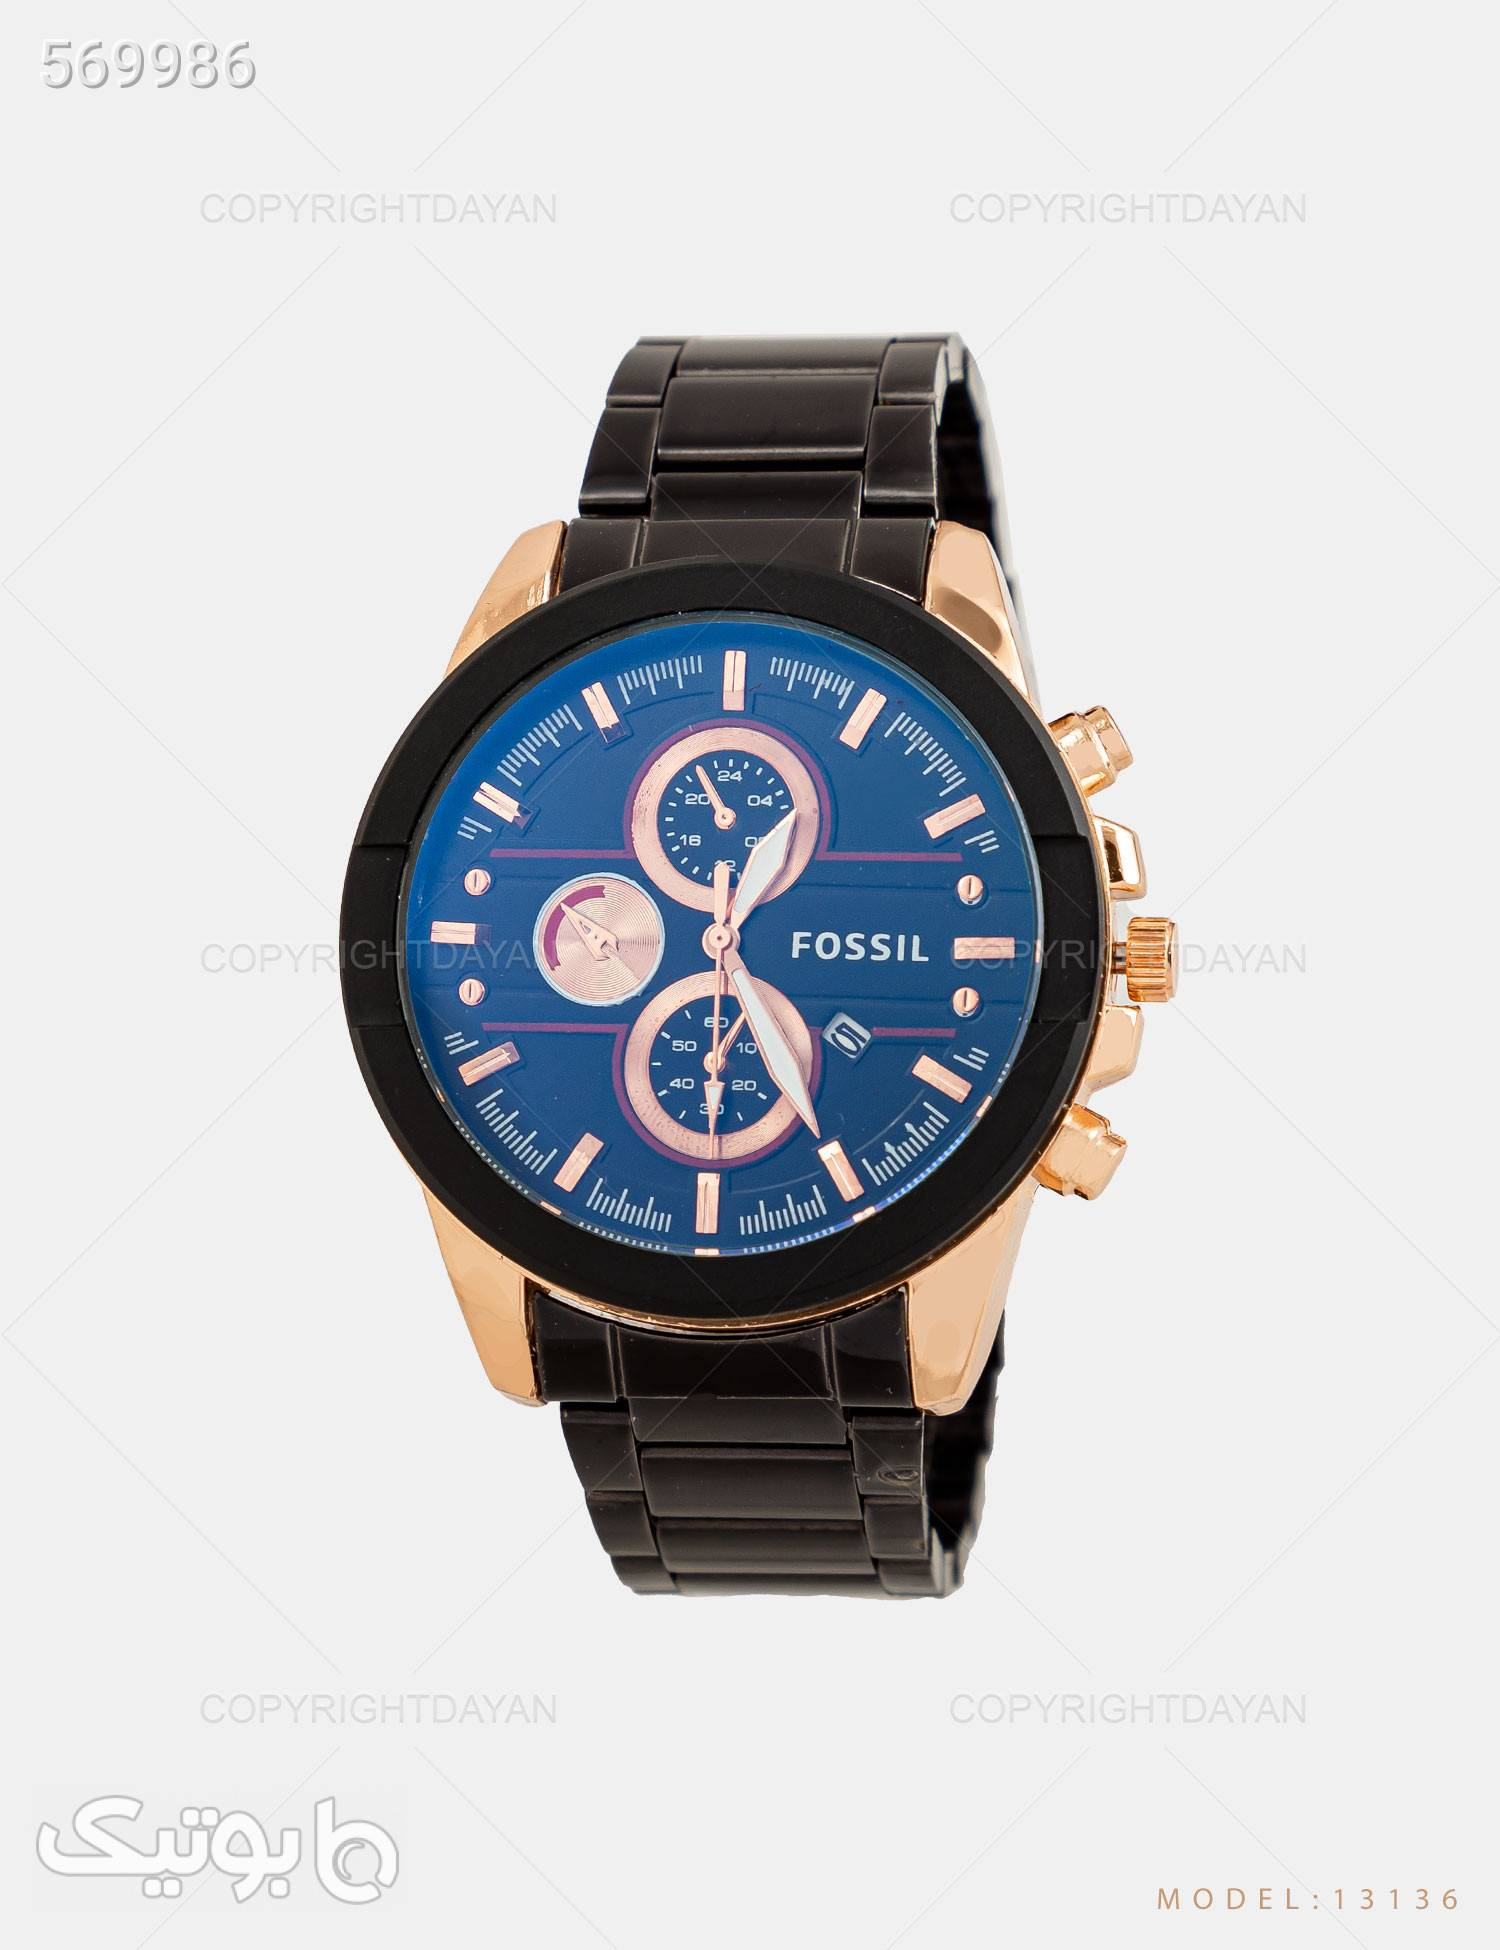 ساعت مچی مردانه Fossil مدل 13136 مشکی ساعت